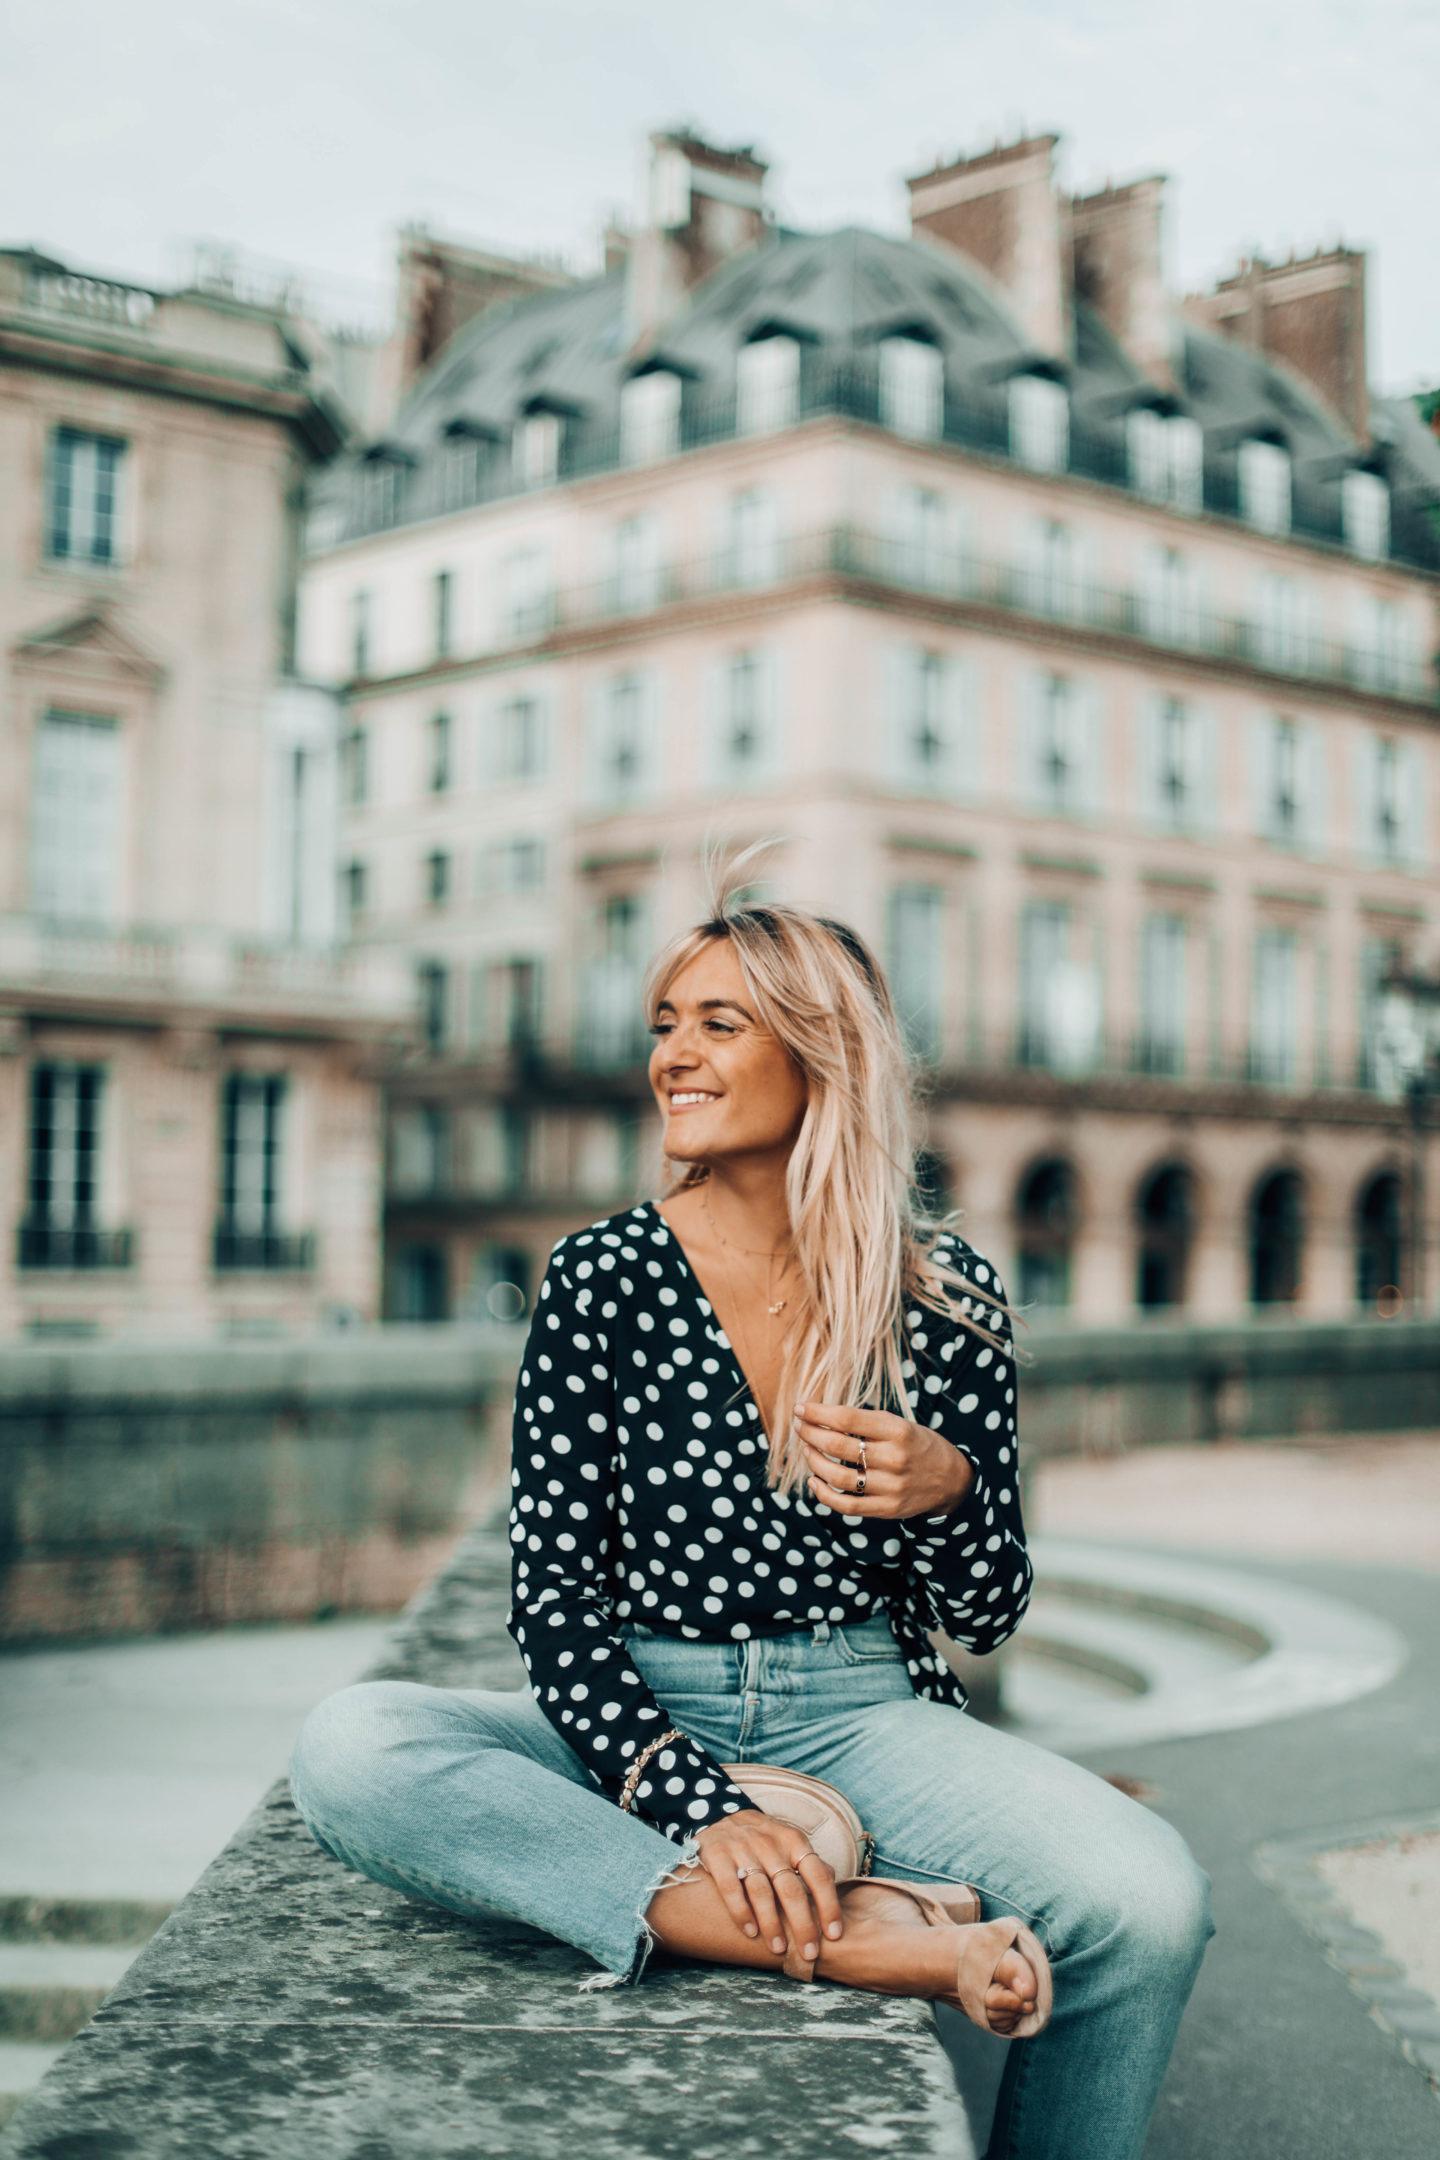 Sac vintage Chanel - Blondie Baby blog mode Paris et voyages